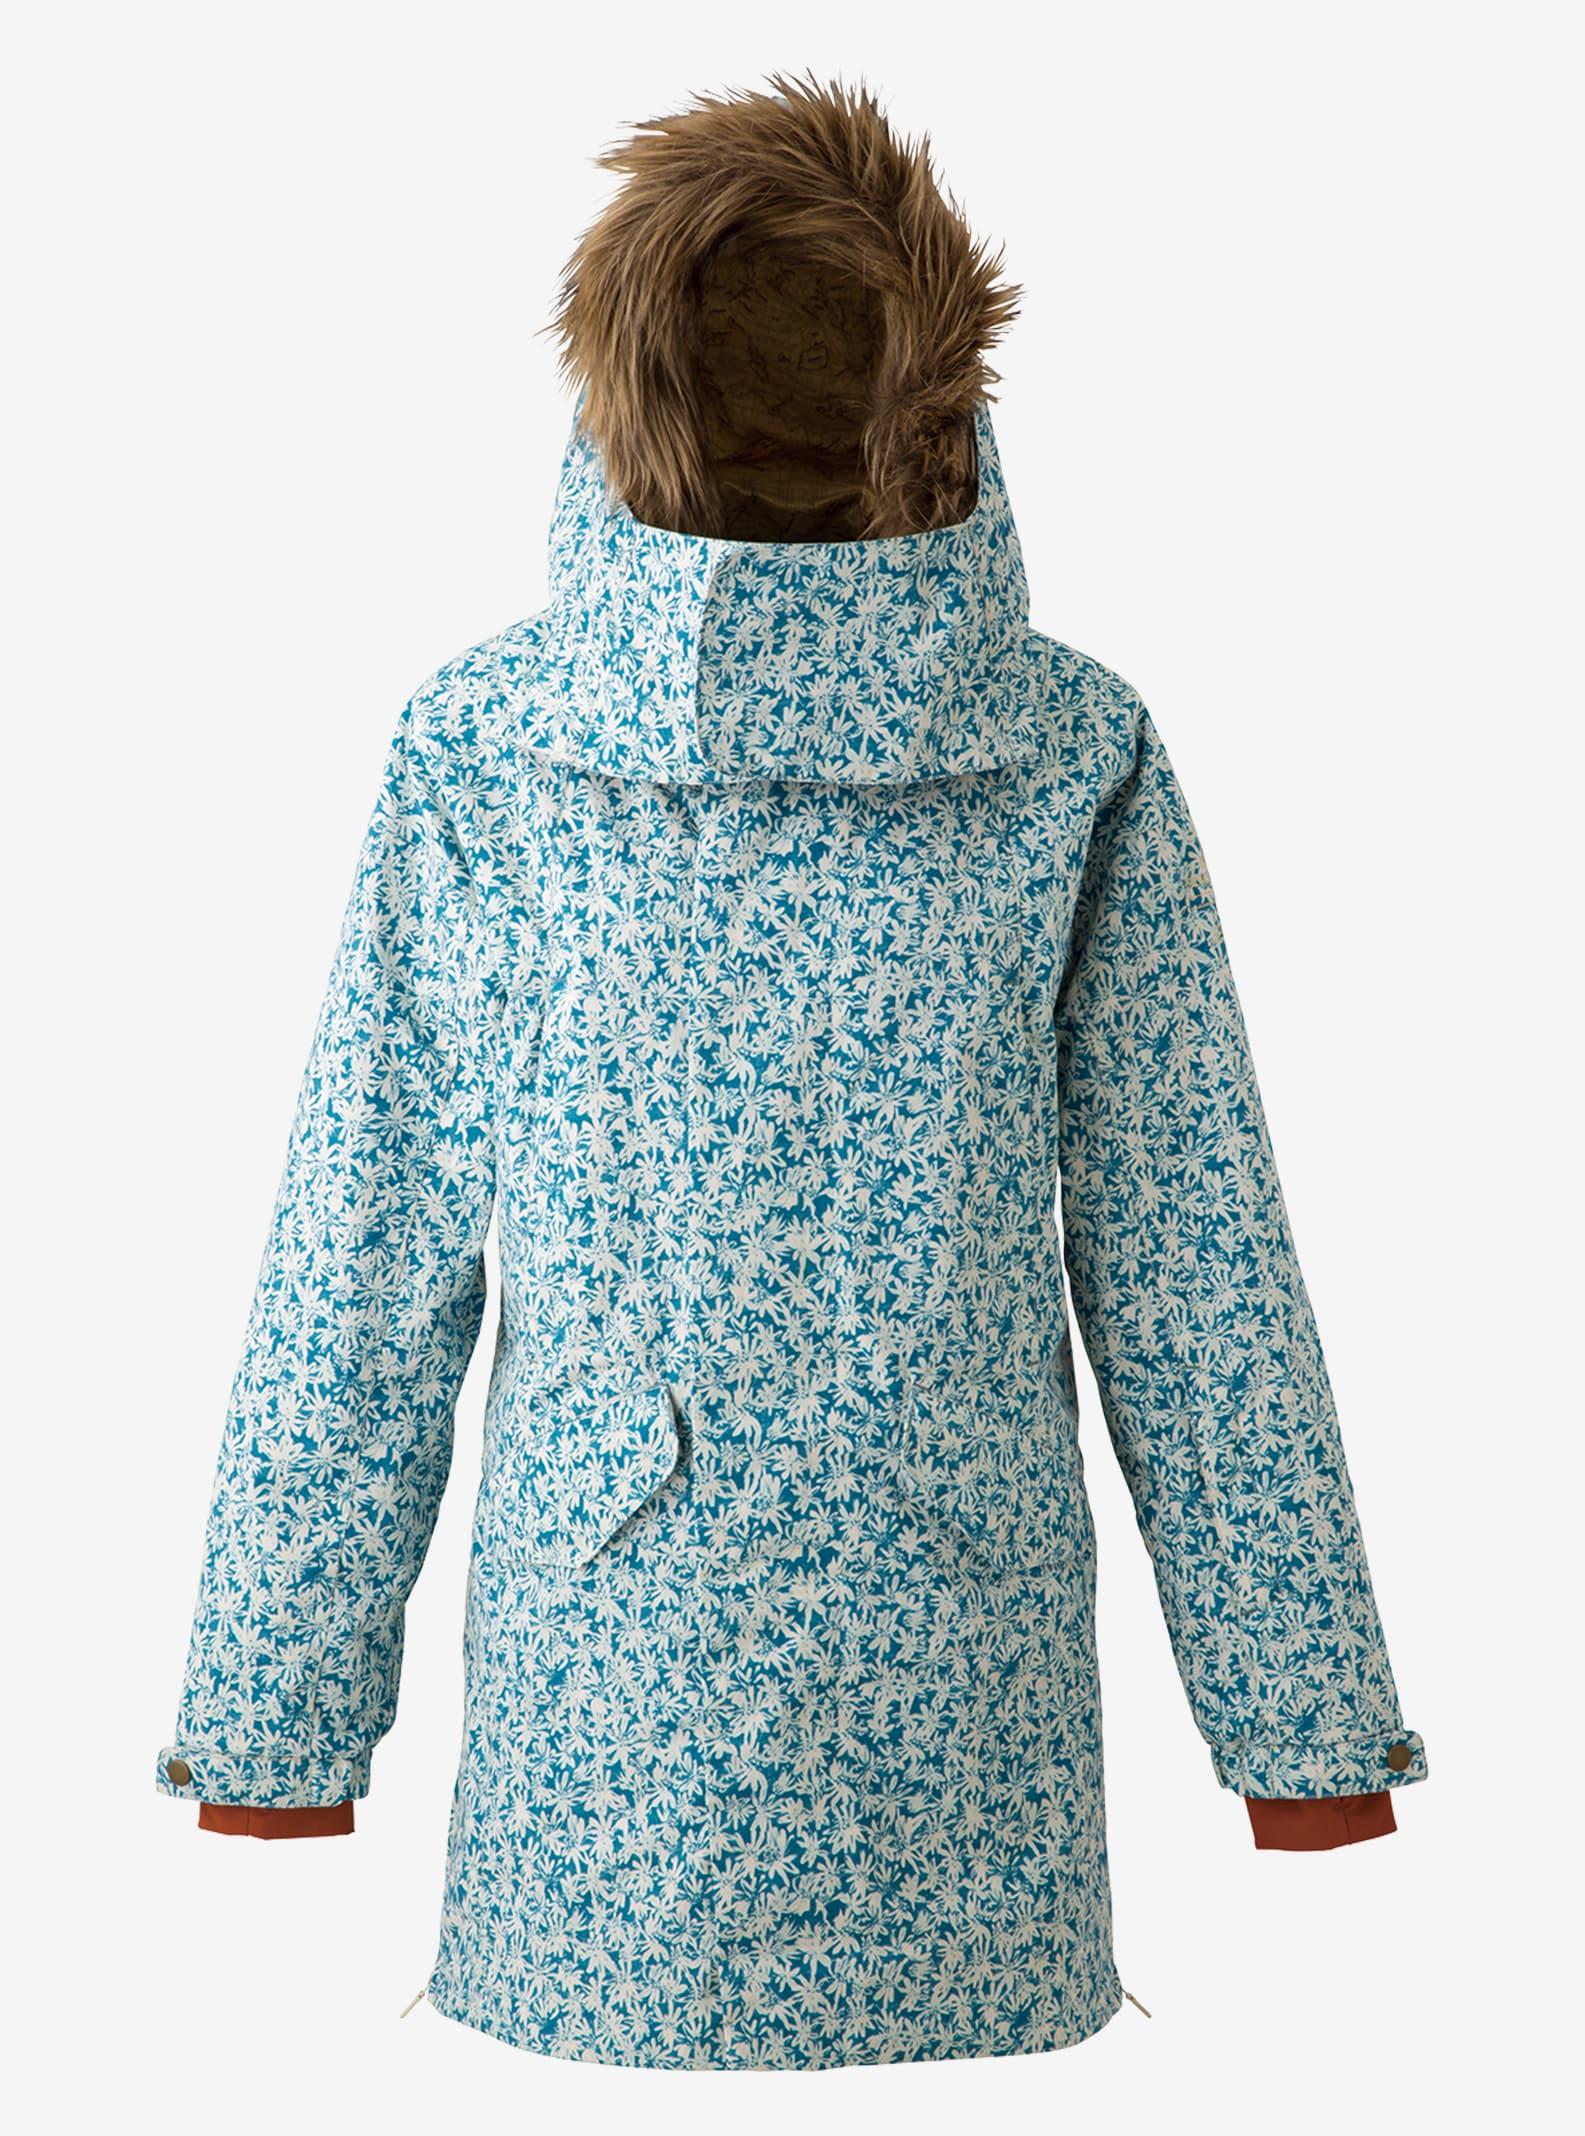 Women's Burton Zenana Jacket shown in Petal Denim